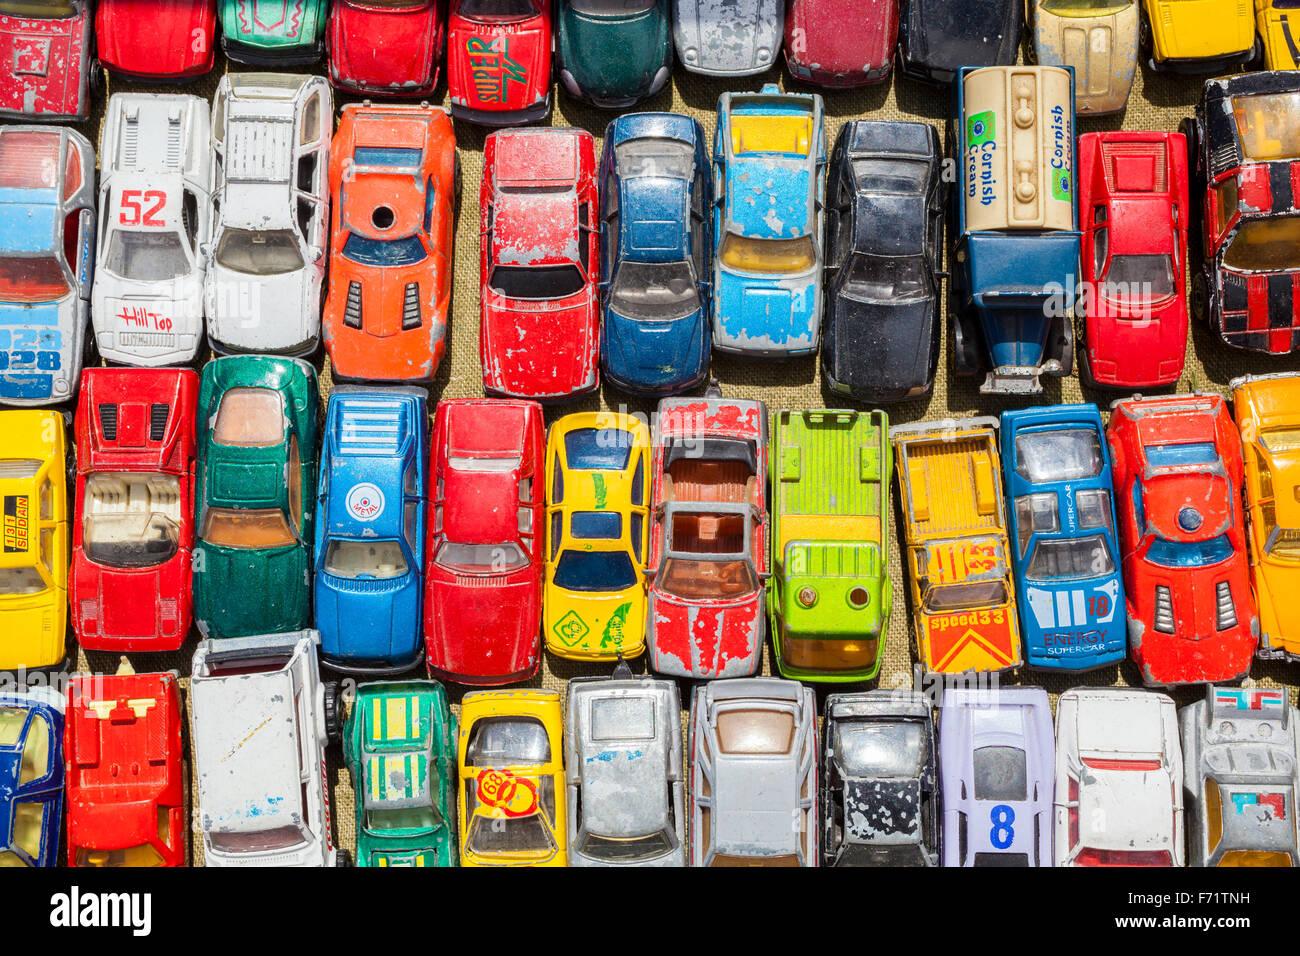 Brocken Used Toys : Toy car broken stock photos images